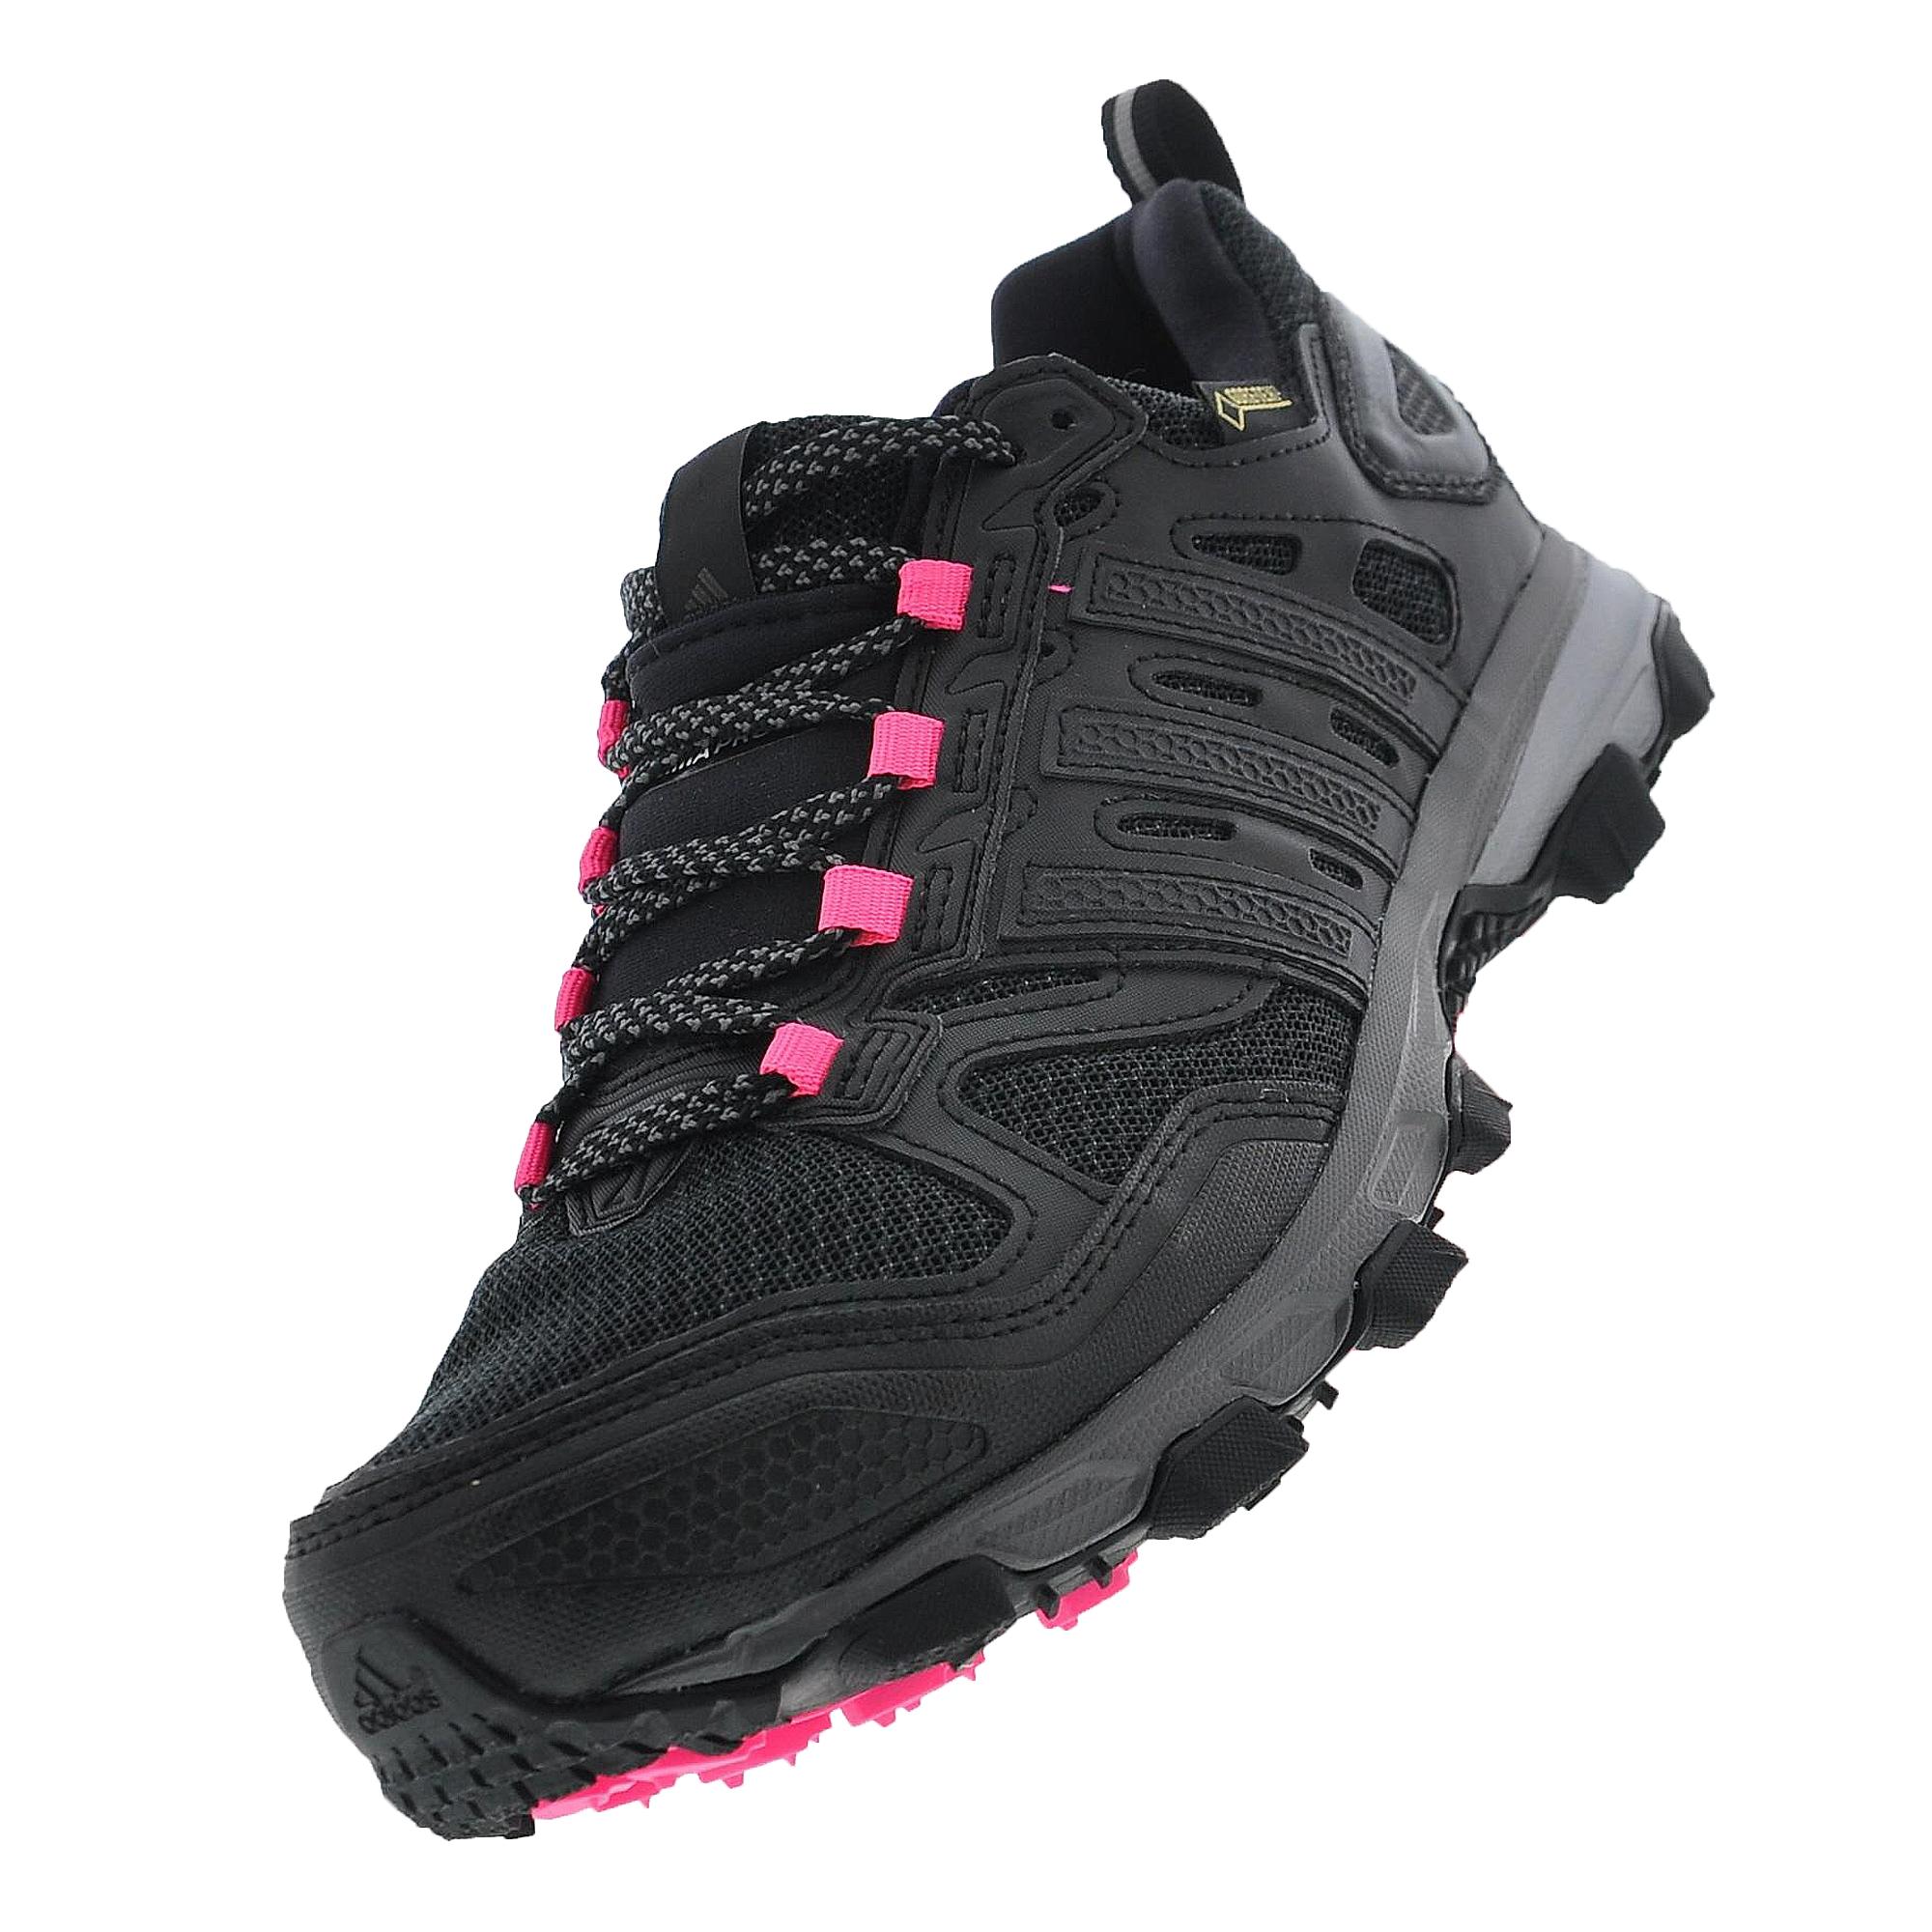 new product fc490 8a2cb adidas Response Trail 21 Gore-tex Kadın Spor Ayakkabı